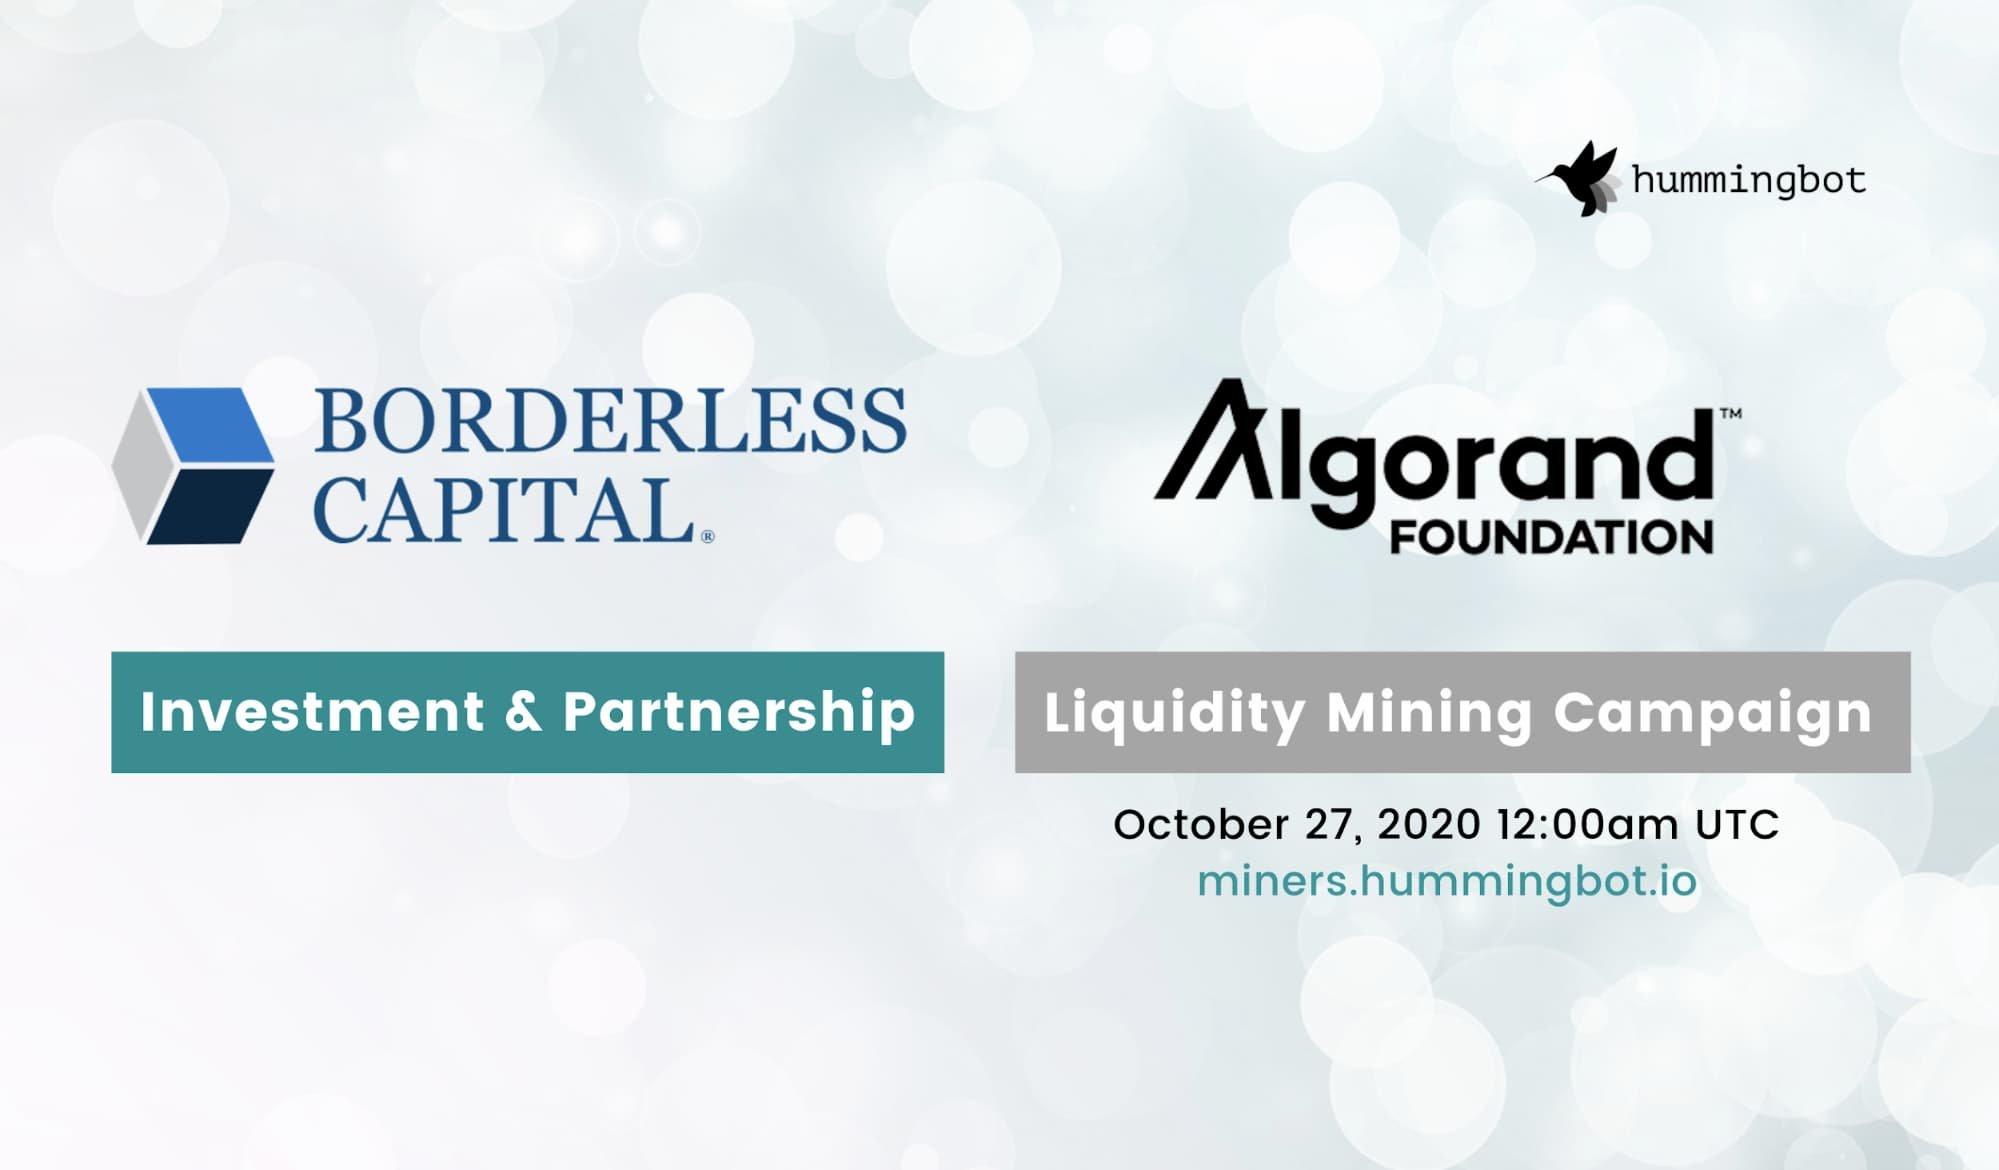 Borderless Capital / Algorand Foundation partnership